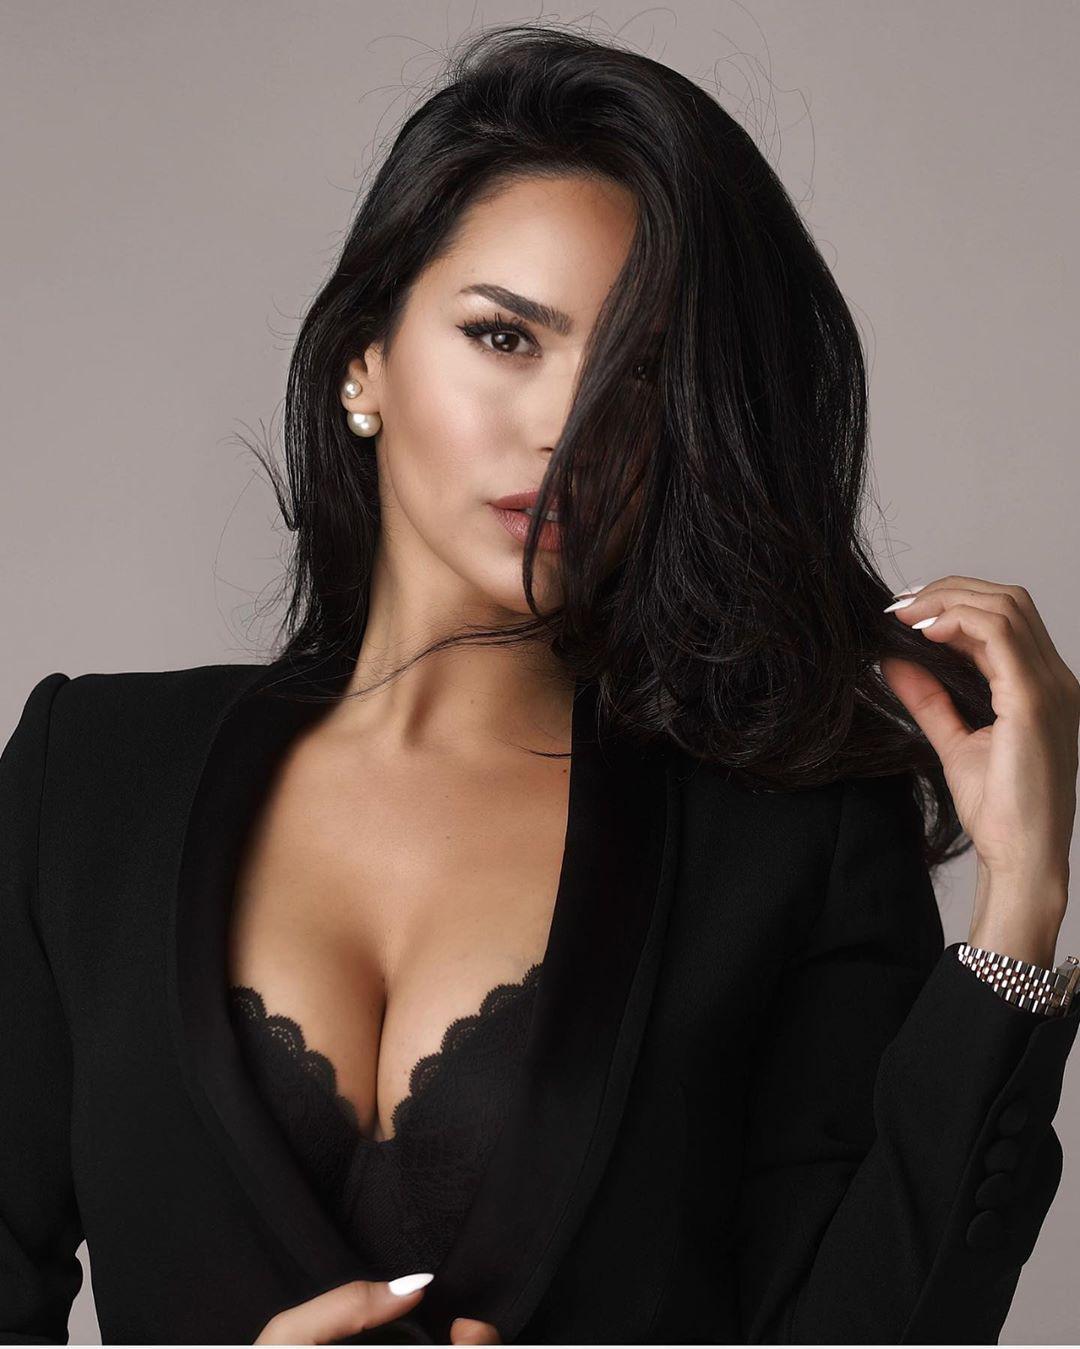 Shadi Y Cair photoshoot poses, Beautiful Black Hairs, Glossy Lips